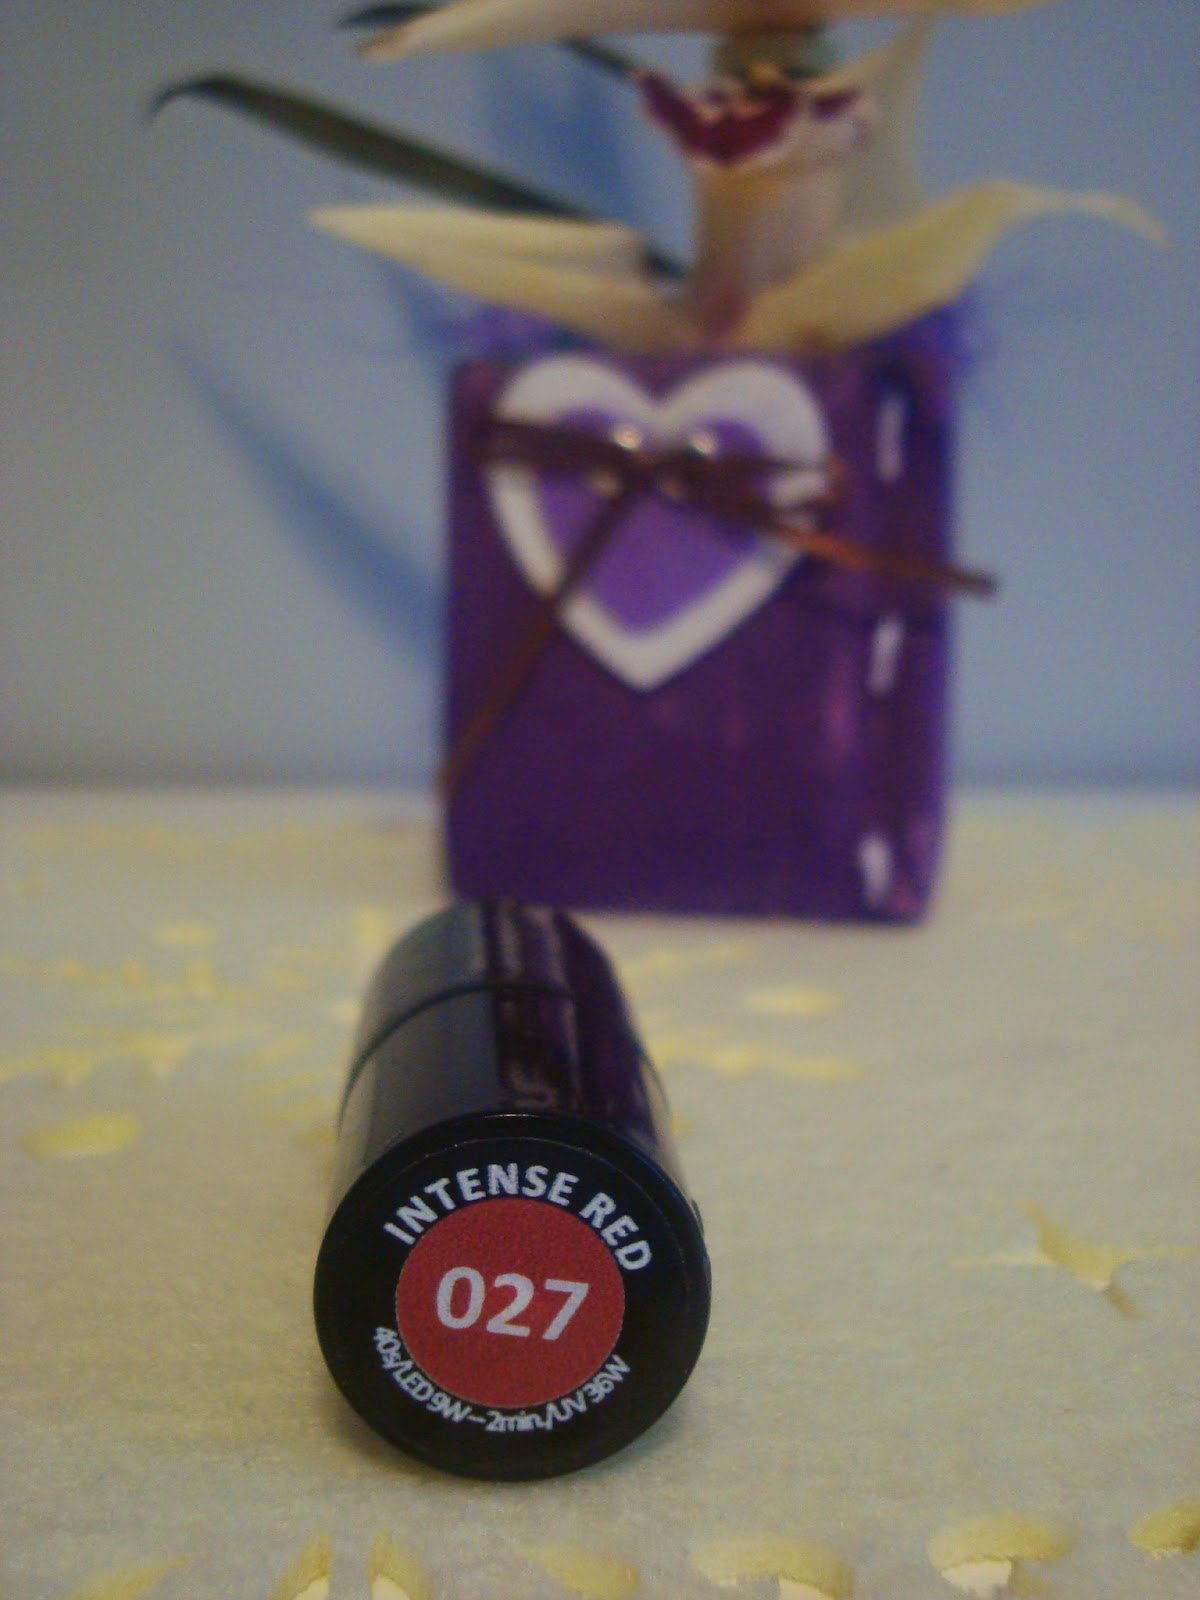 Moja mała, wielka miłość - Semilac 027 Intense Red